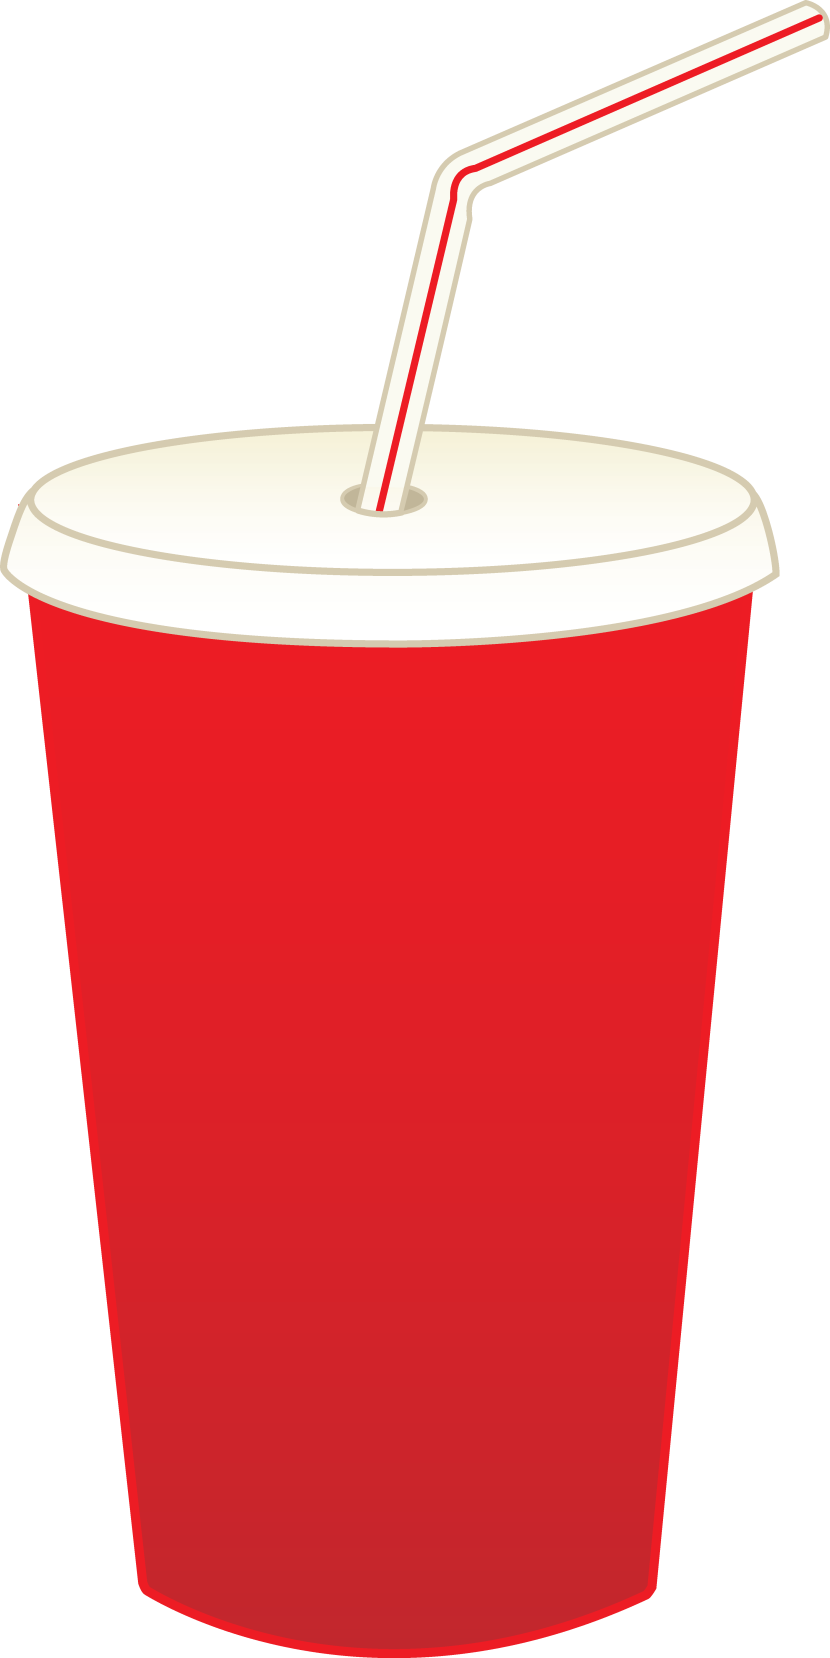 Tsoda clipart jpg freeuse download Soda clipart 2 - Clipartix jpg freeuse download